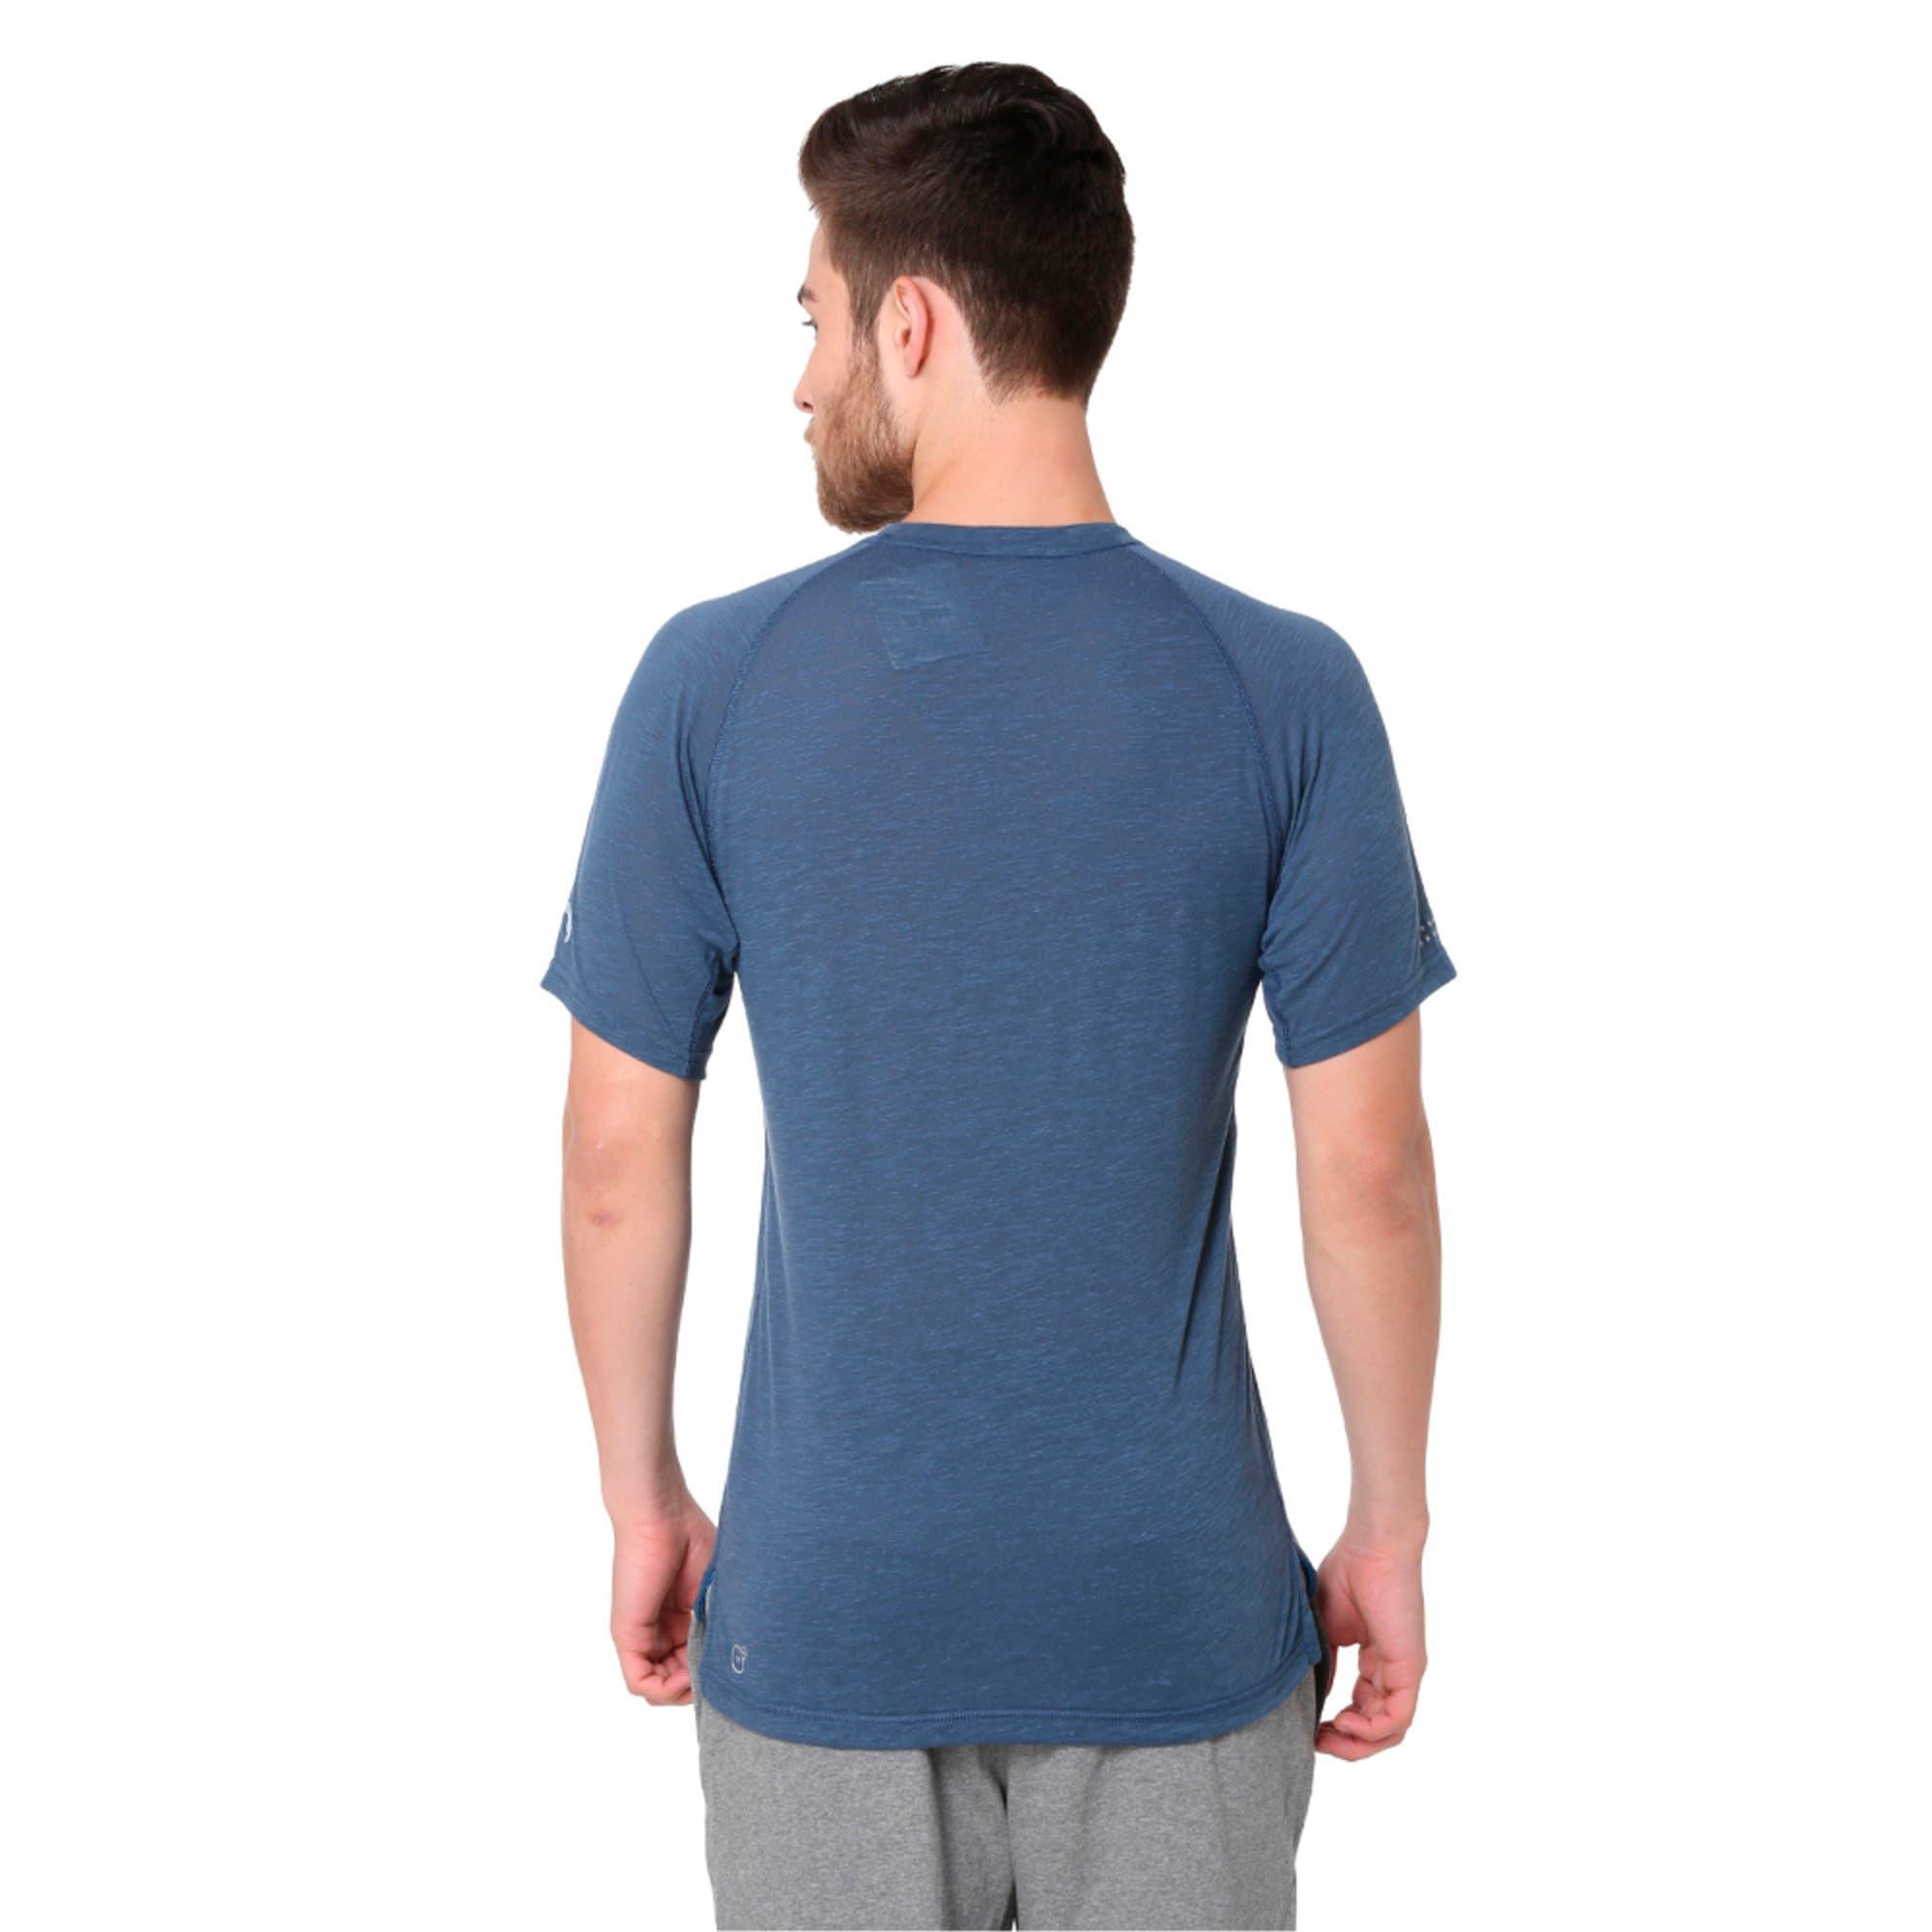 Thumbnail 1 of Energy Short Sleeve Men's Running T-Shirt, Sargasso Sea Heather, medium-IND